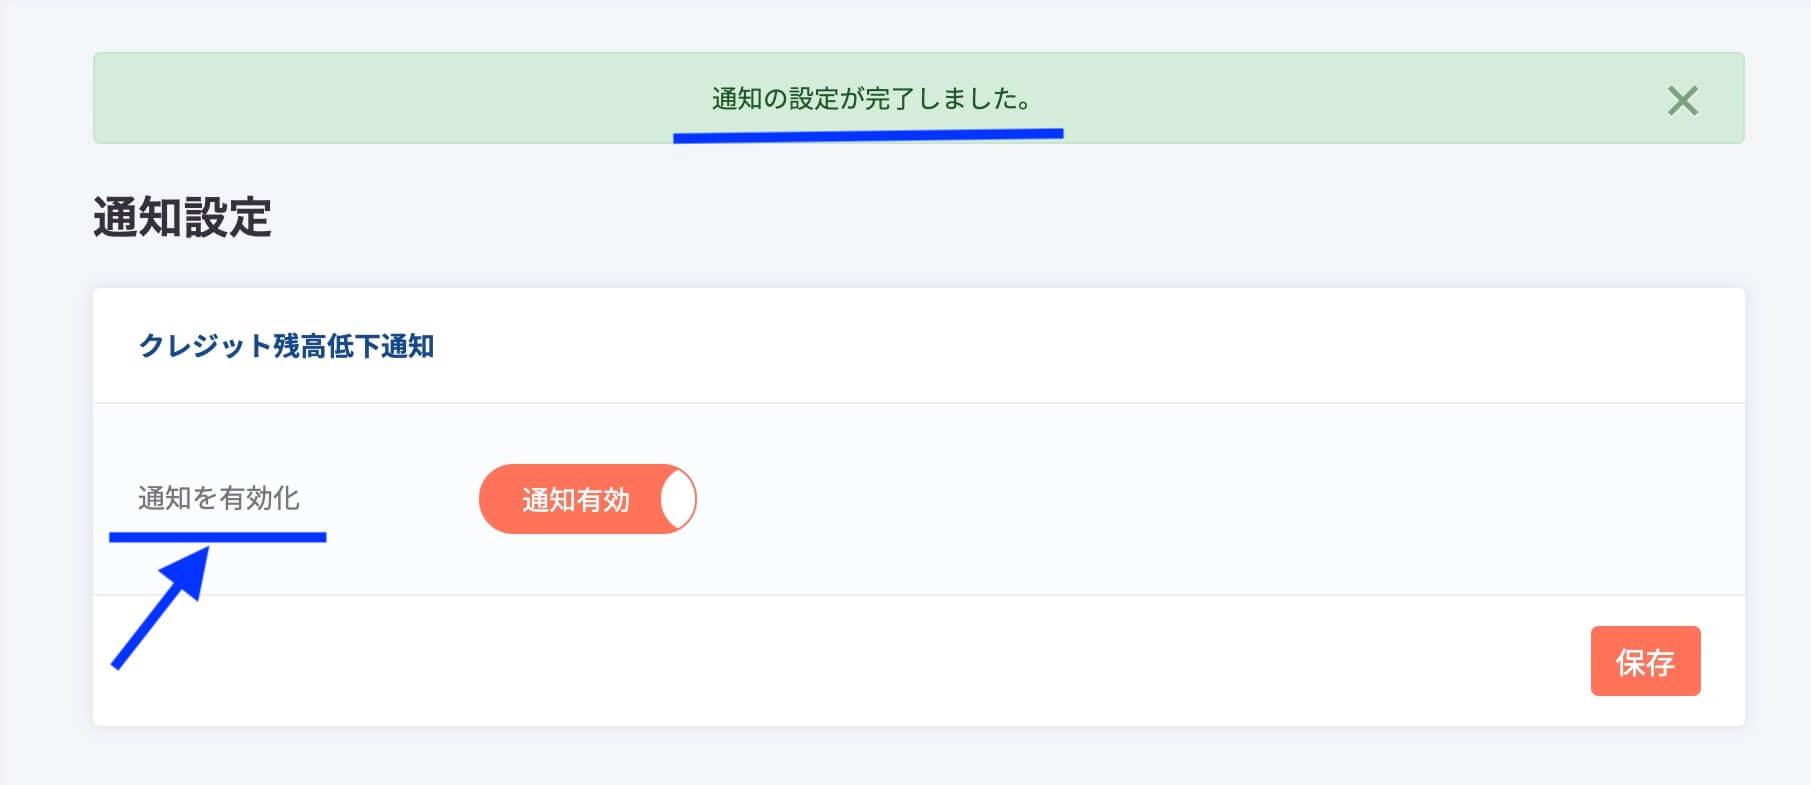 set amount comfirmation